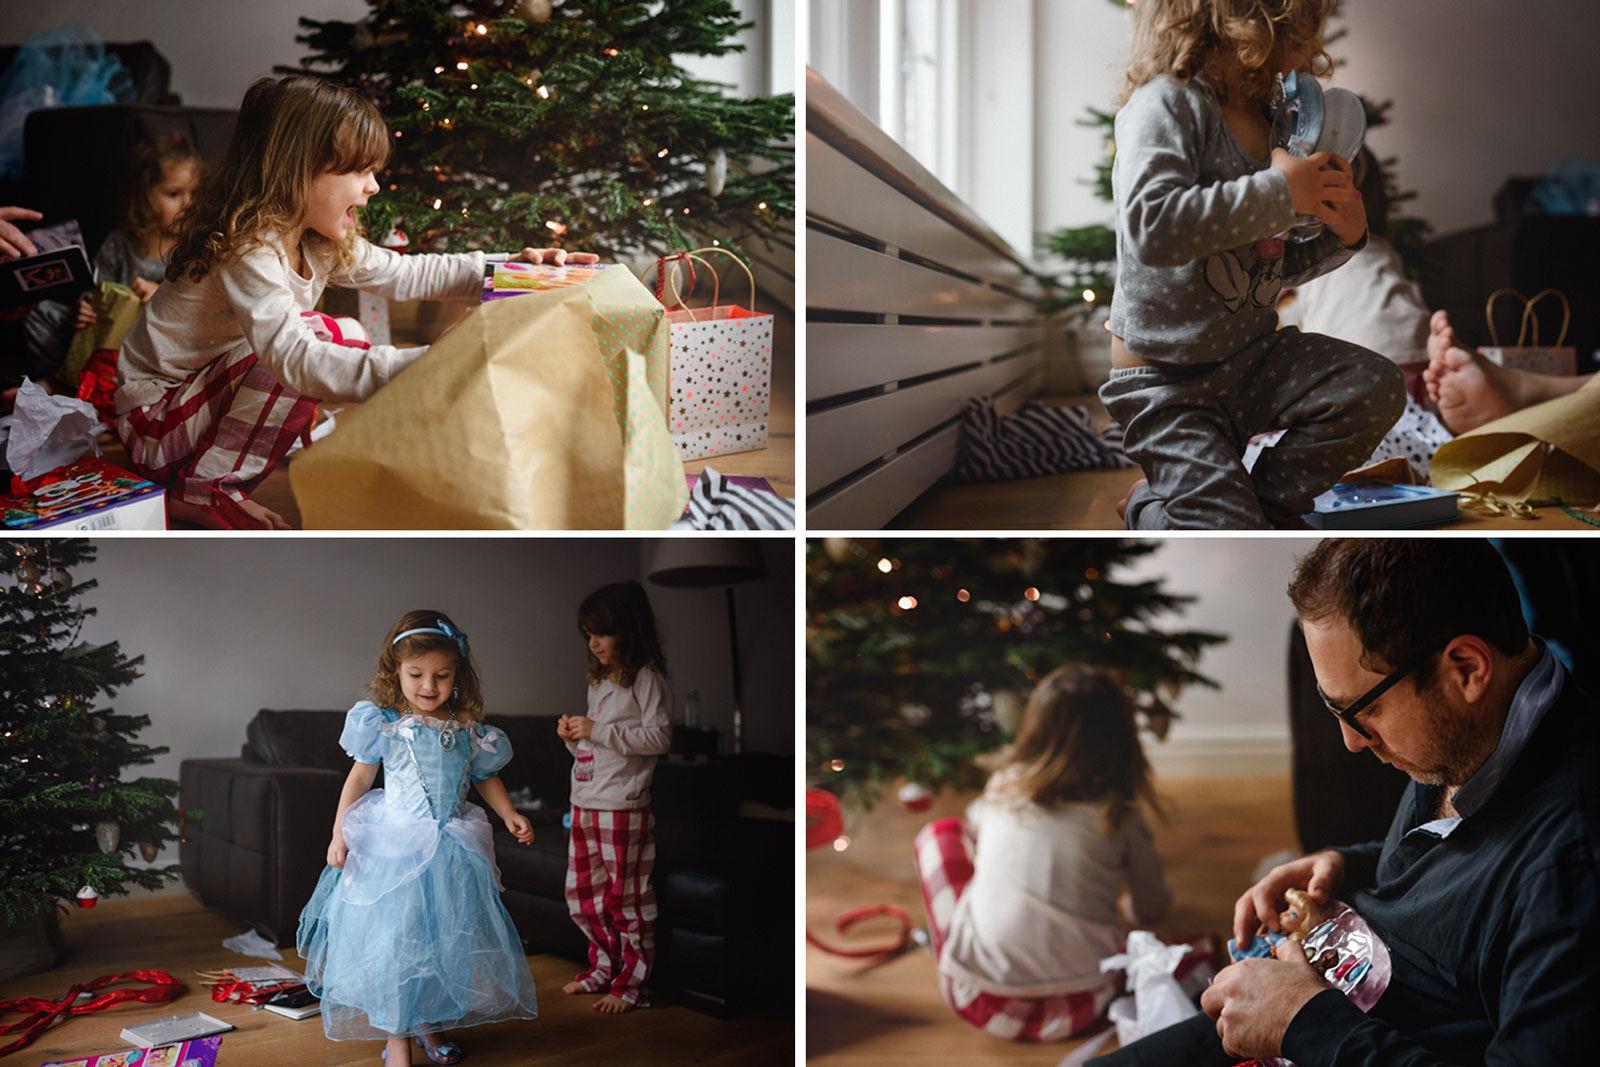 photos of kids opening Christmas presents by Anita Perminova